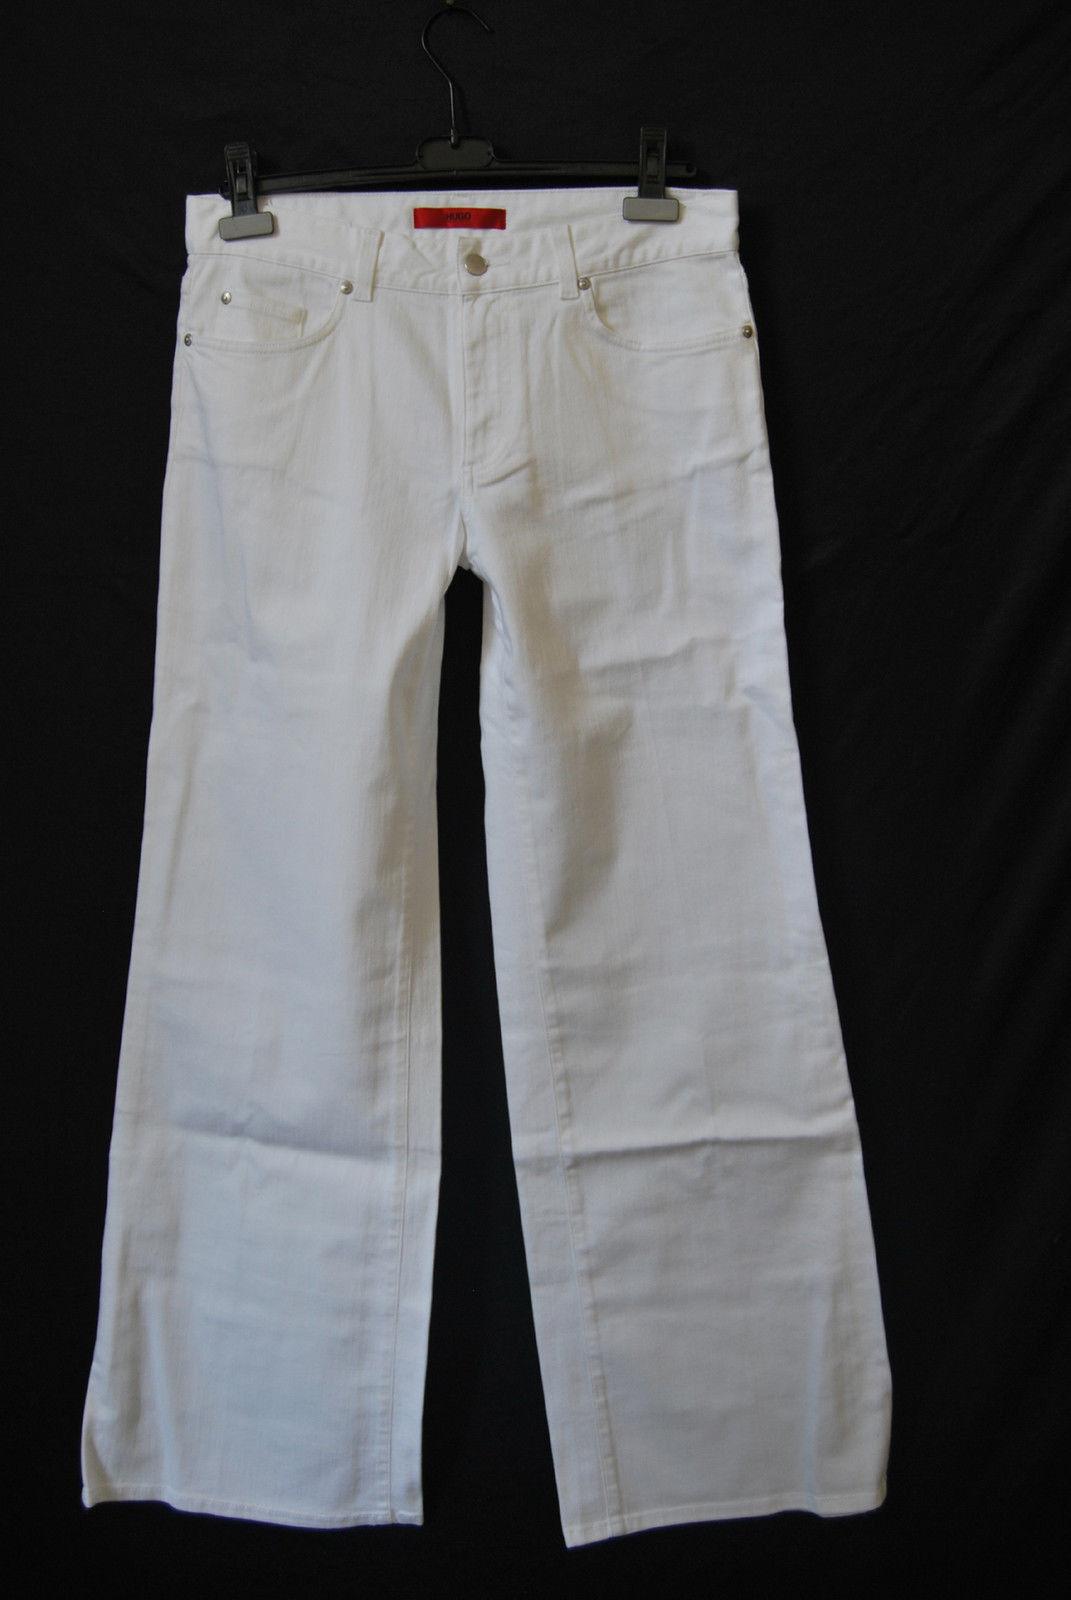 Hugo BOSS Jeans Hose W28 L34 WEICH  STRETCH wide leg Marlene 189,- EDEL  D-1594